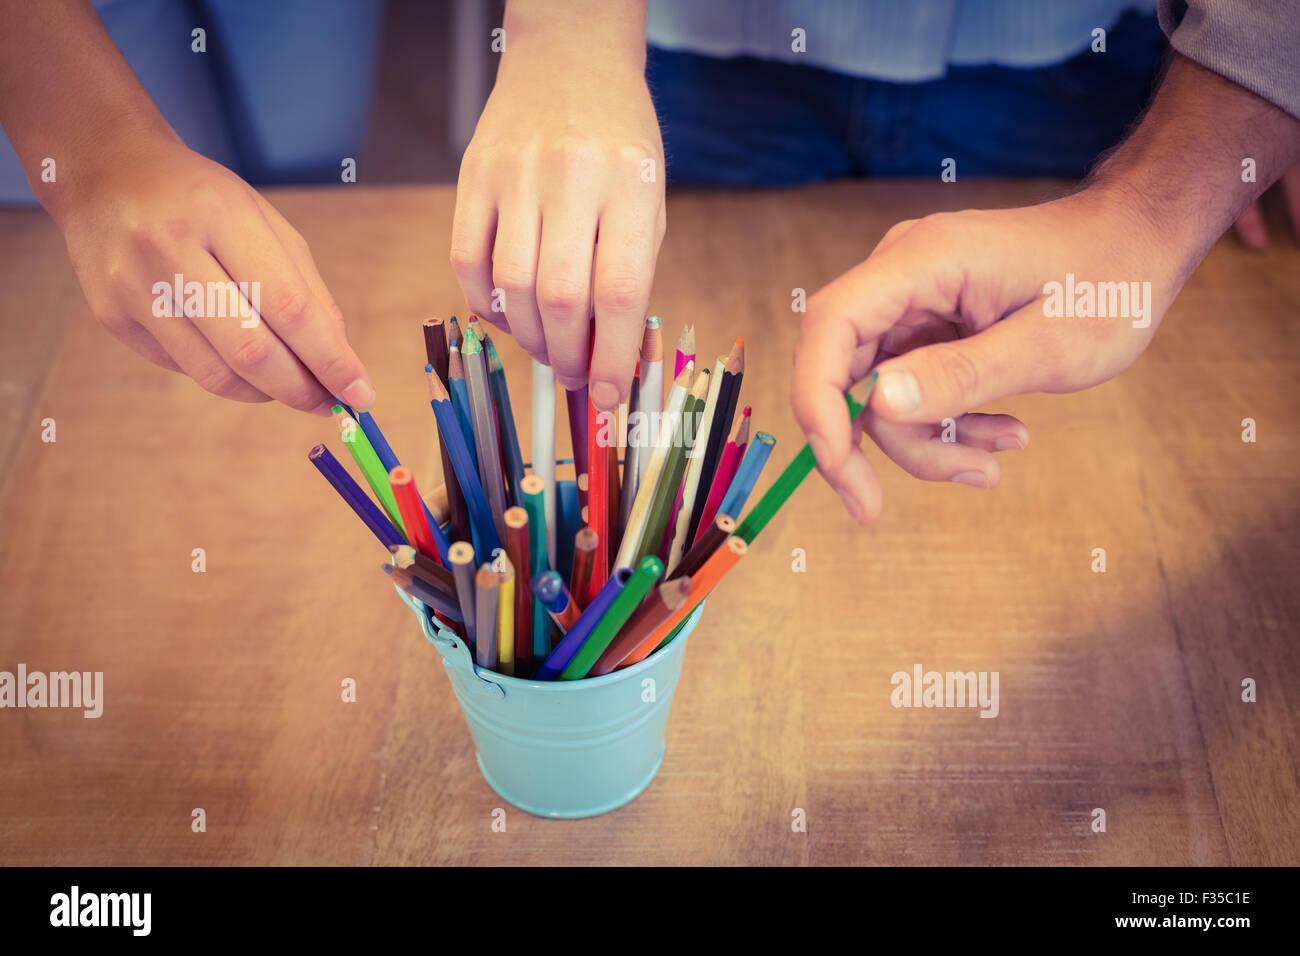 Gente de negocios elegir lápices de organizador de escritorio Imagen De Stock